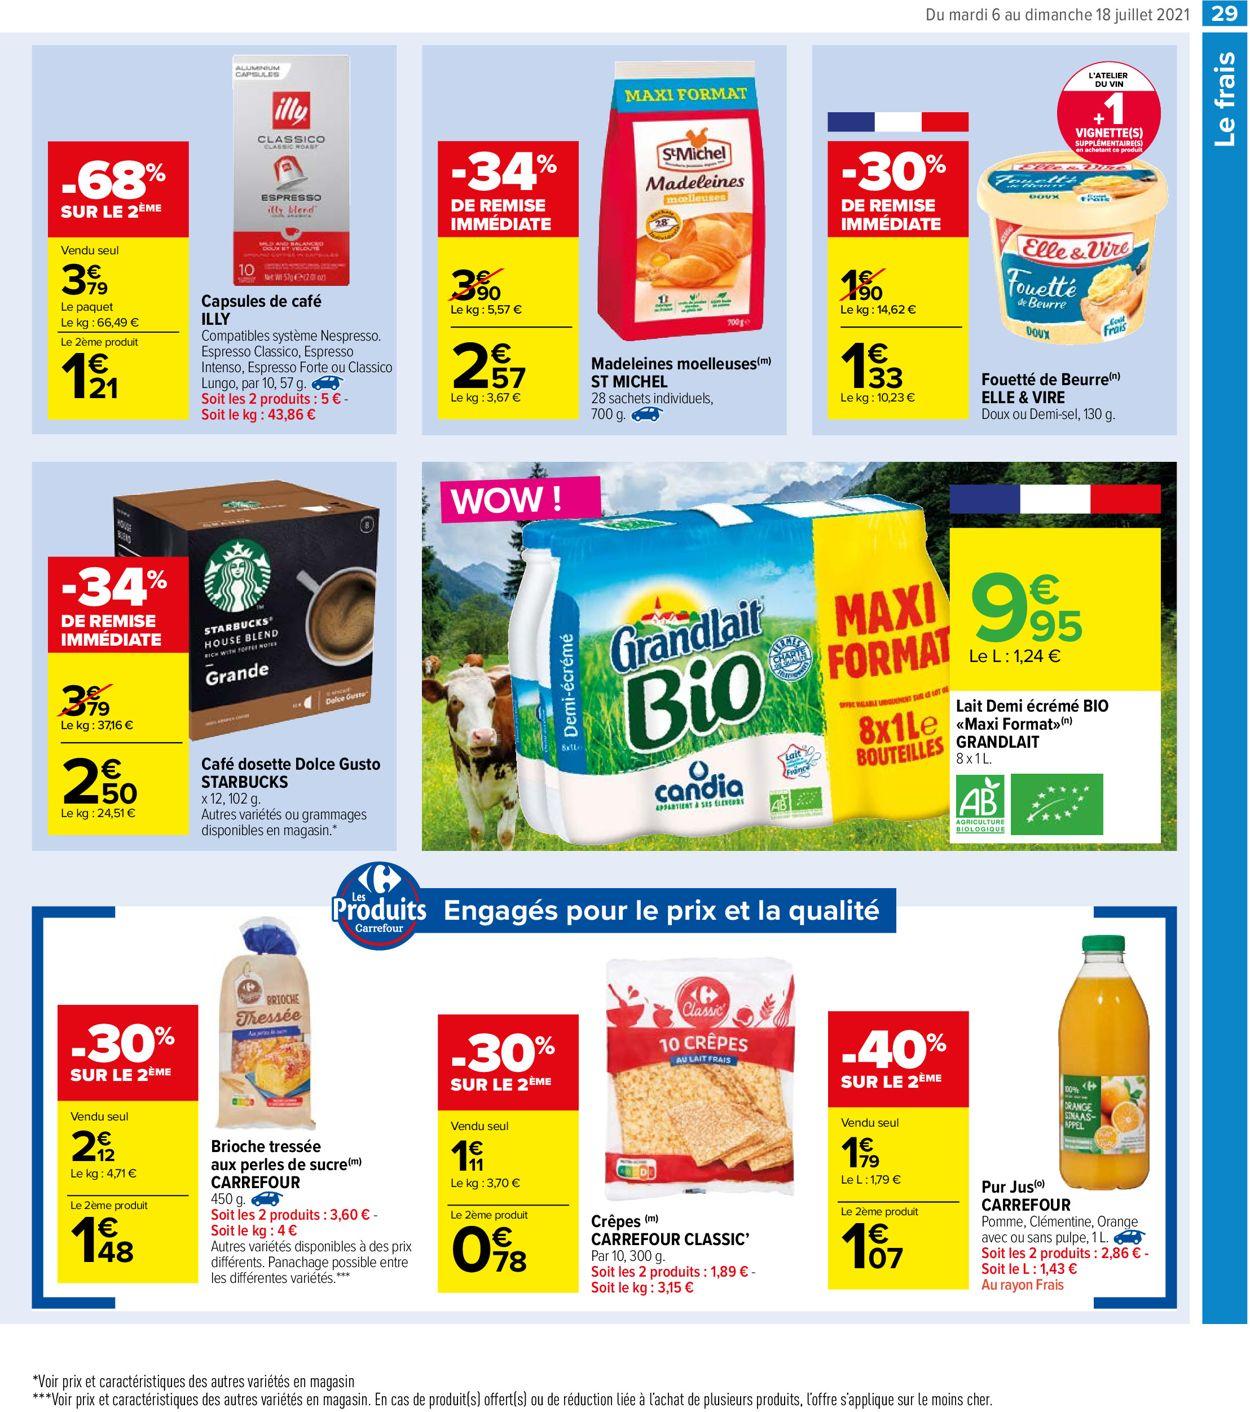 Carrefour Catalogue - 06.07-18.07.2021 (Page 29)